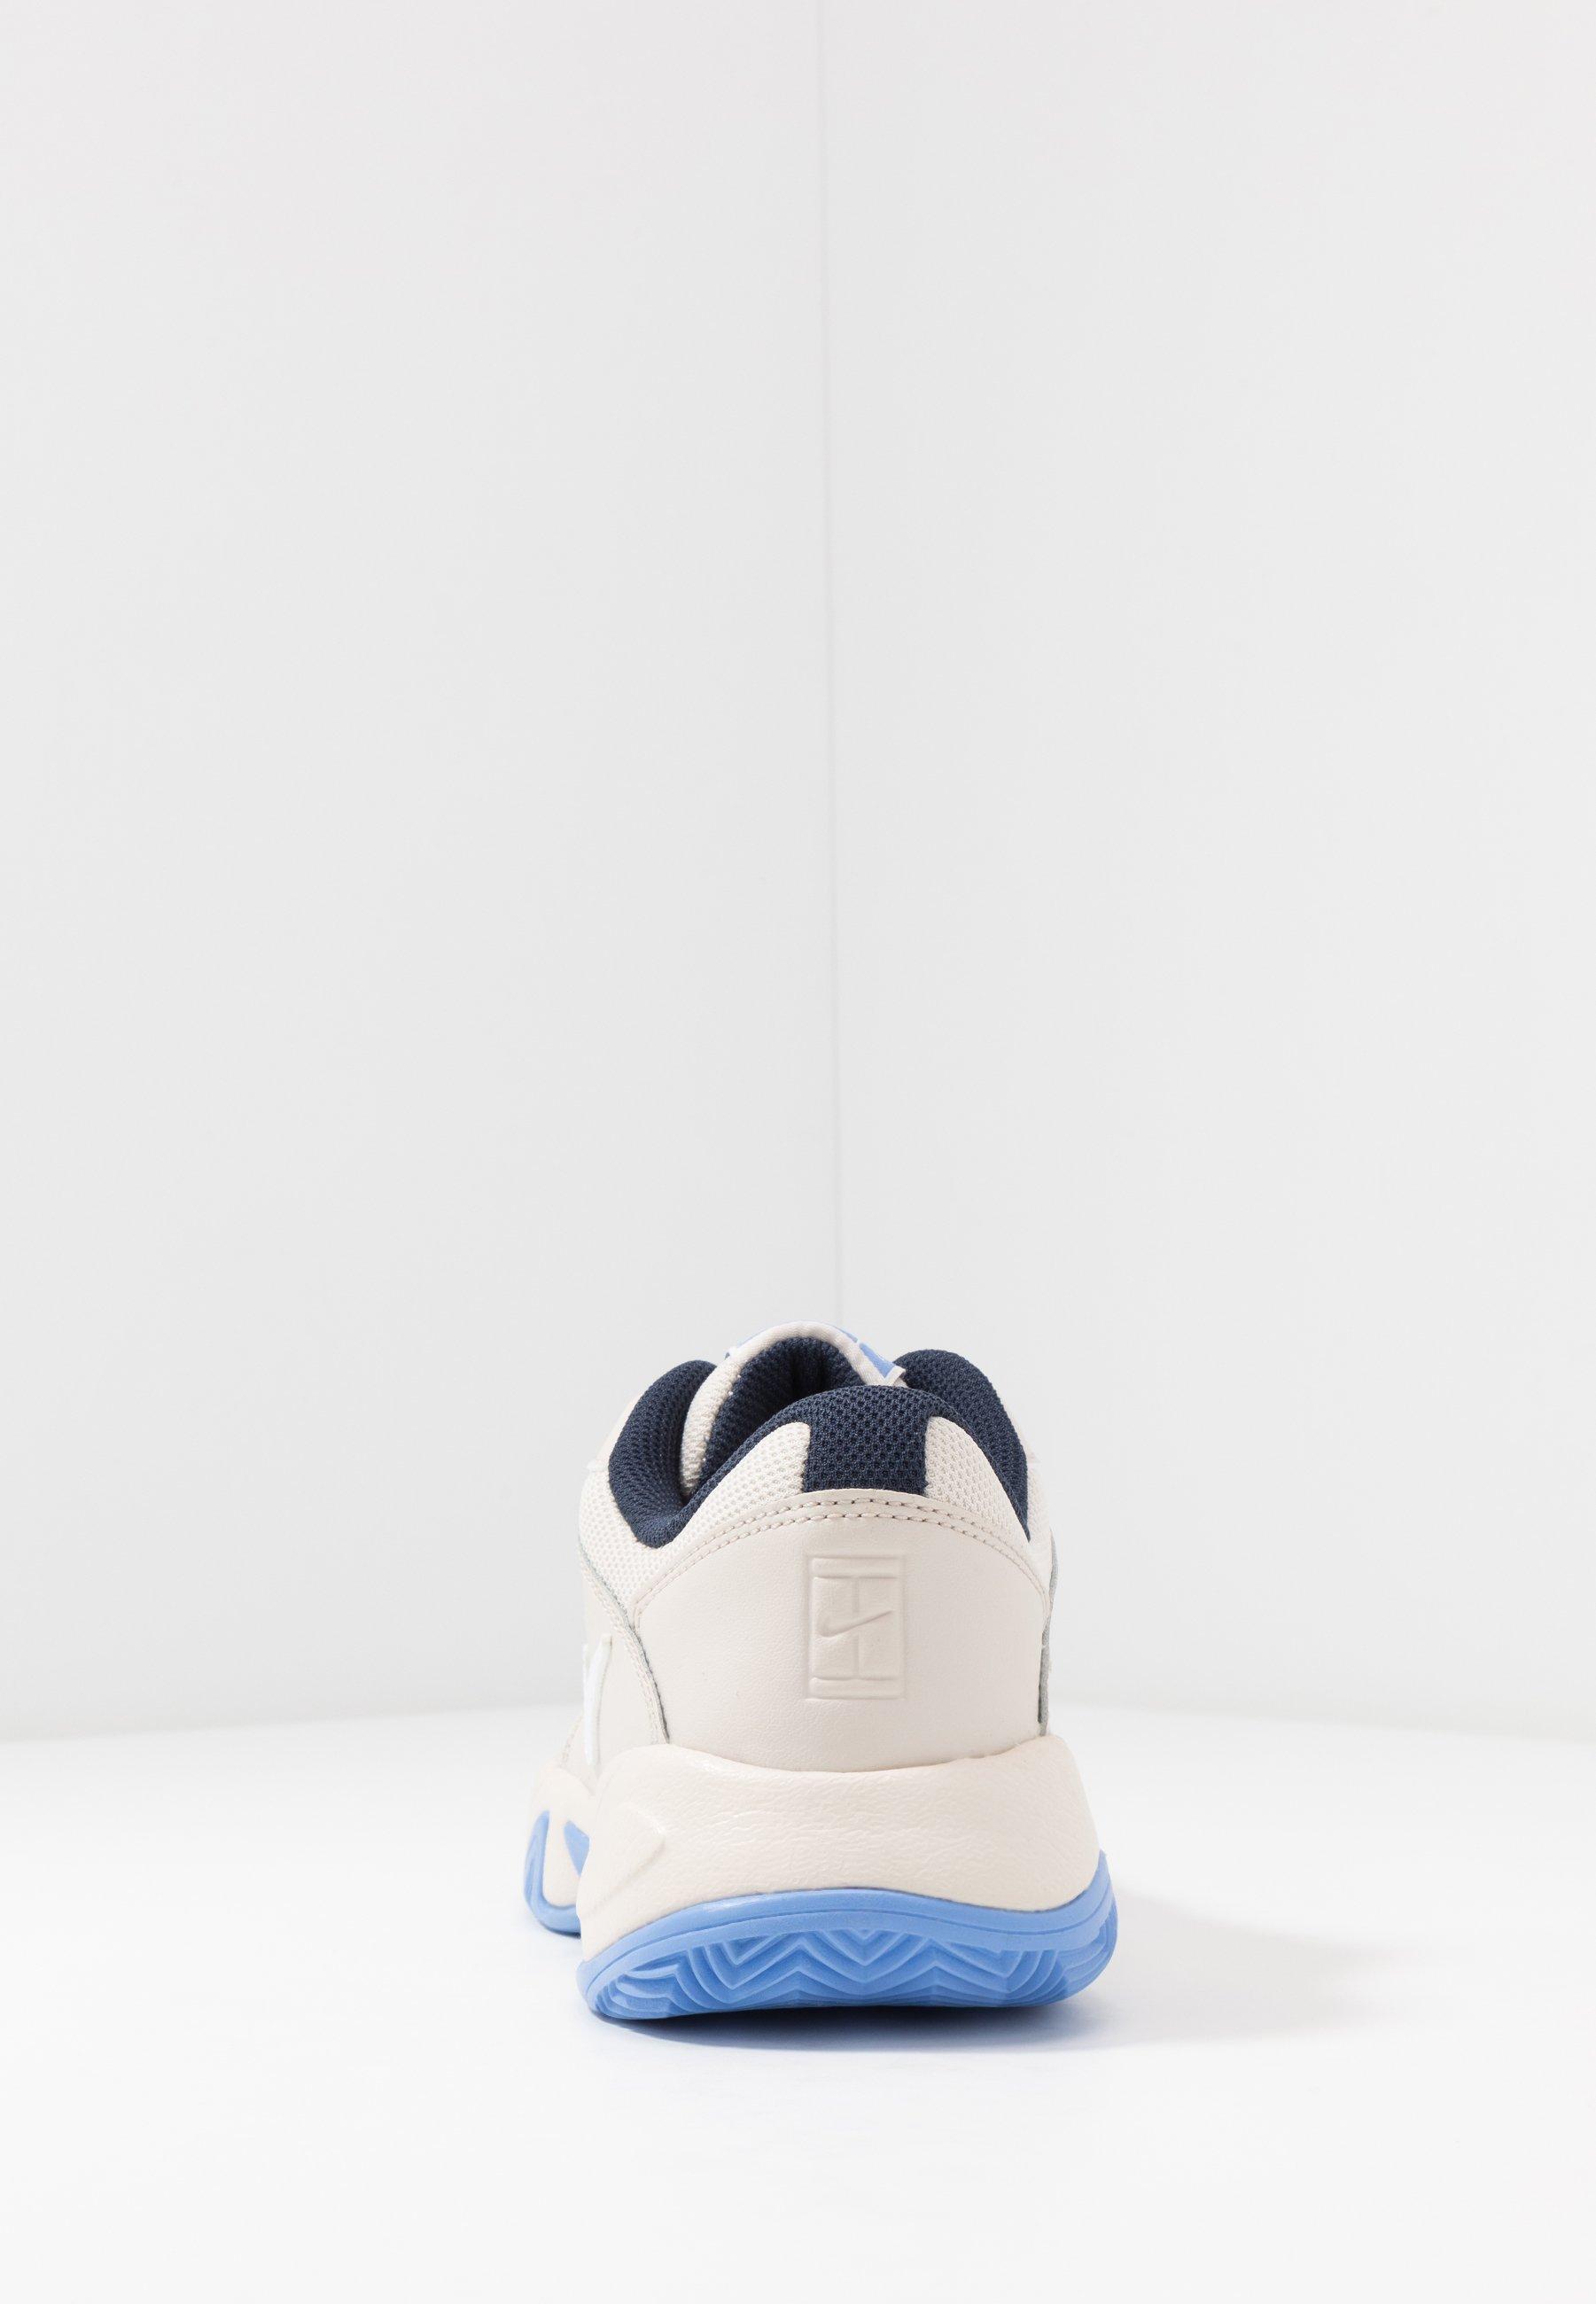 Nike Performance COURT LITE 2 CLAY - Tennisskor för grus - light orewood brown/white/royal pulse